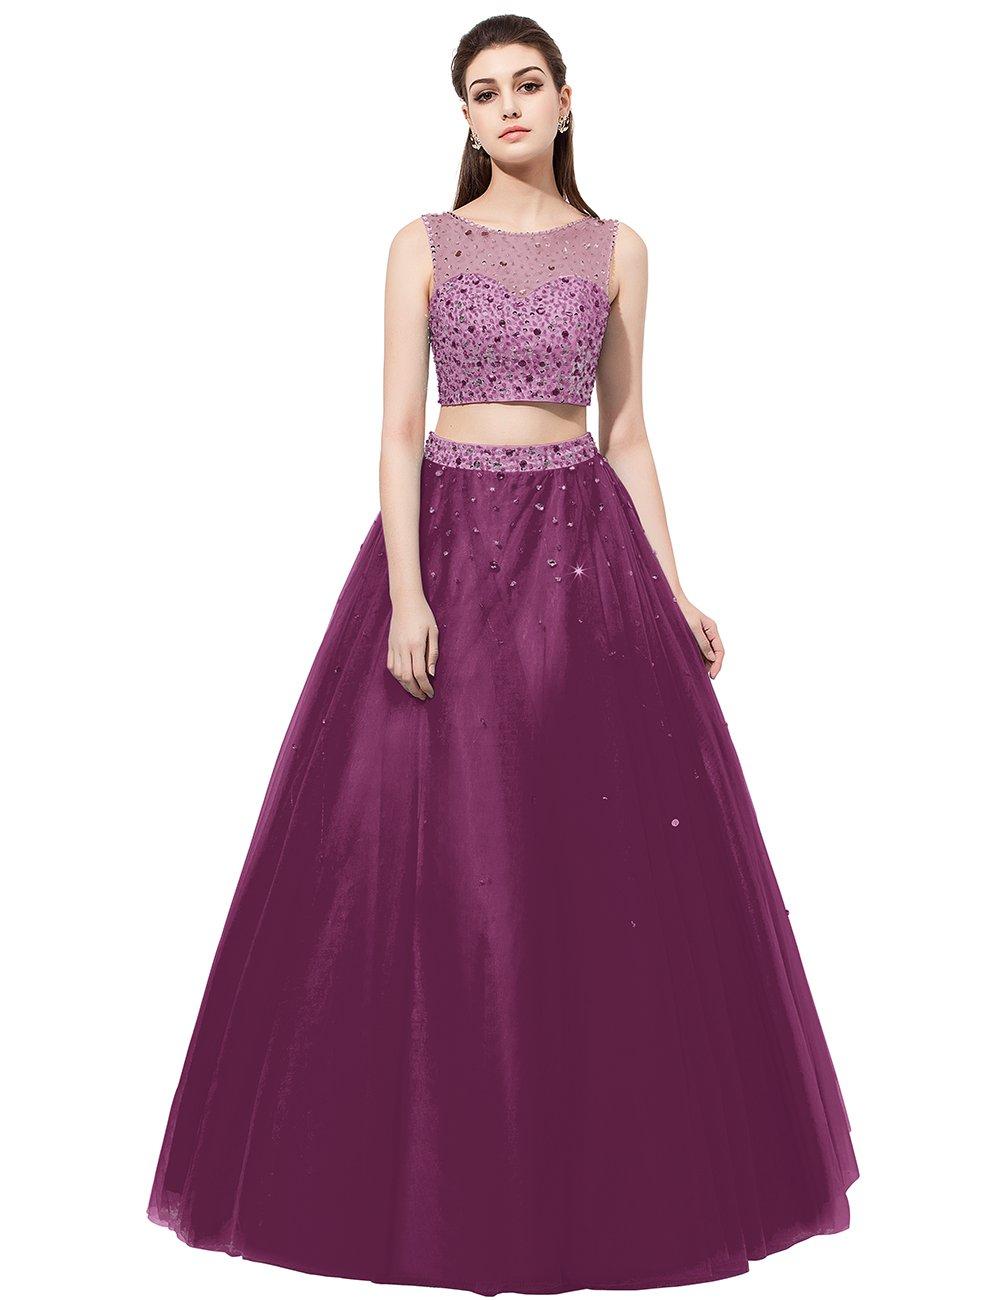 Dresstell 演奏会ドレス ステージドレス ビジュー付き ツーピースドレス 袖なし ビスチェタイプ 発表会ドレス カラーチュチュ 舞台ドレス B01MT5WQSX JP29W|葡萄色 葡萄色 JP29W